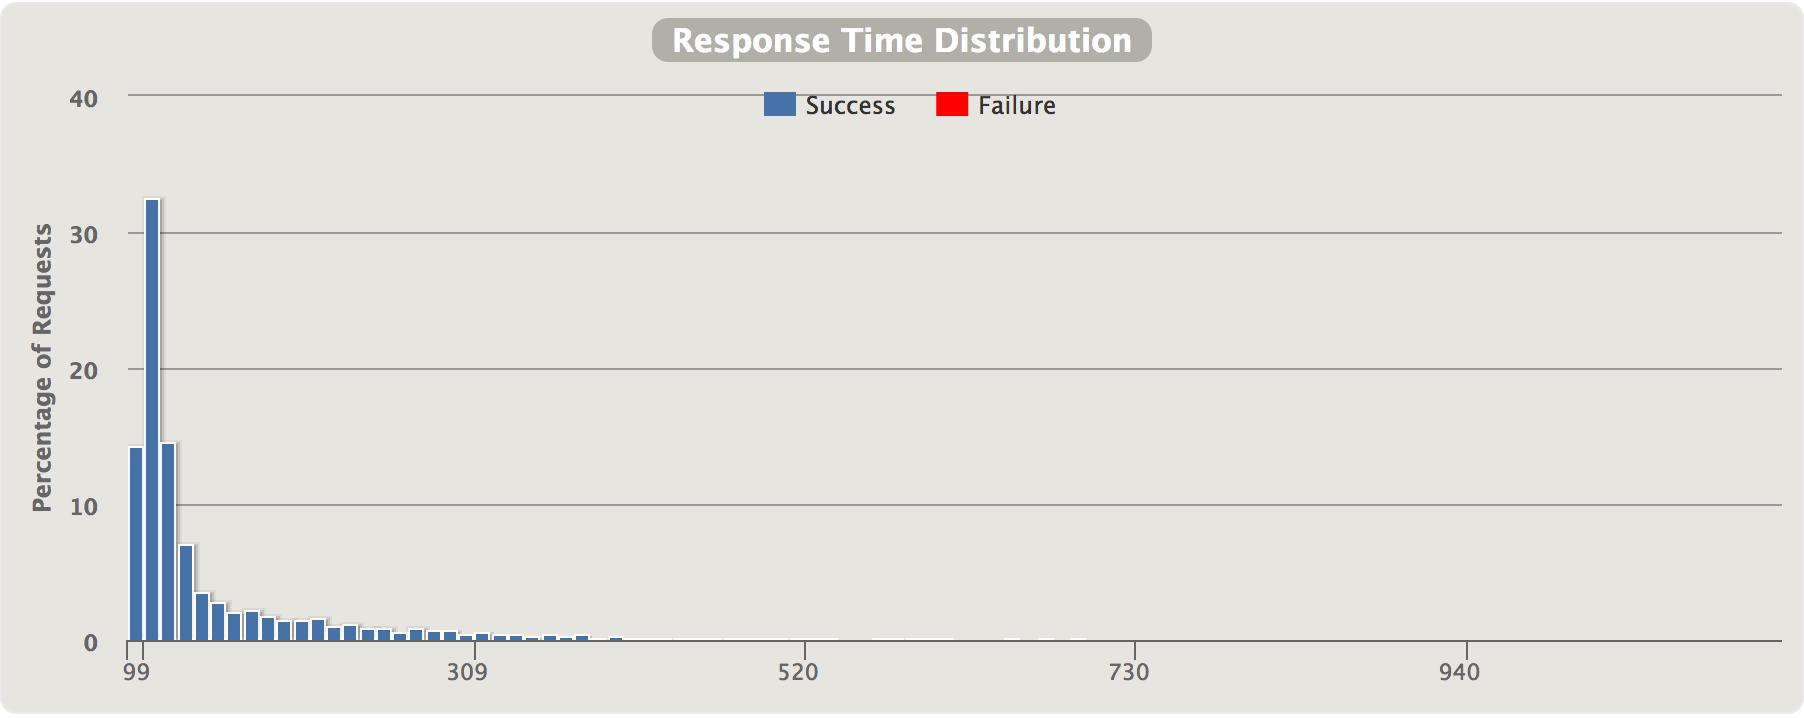 ResponseTimeDistribution